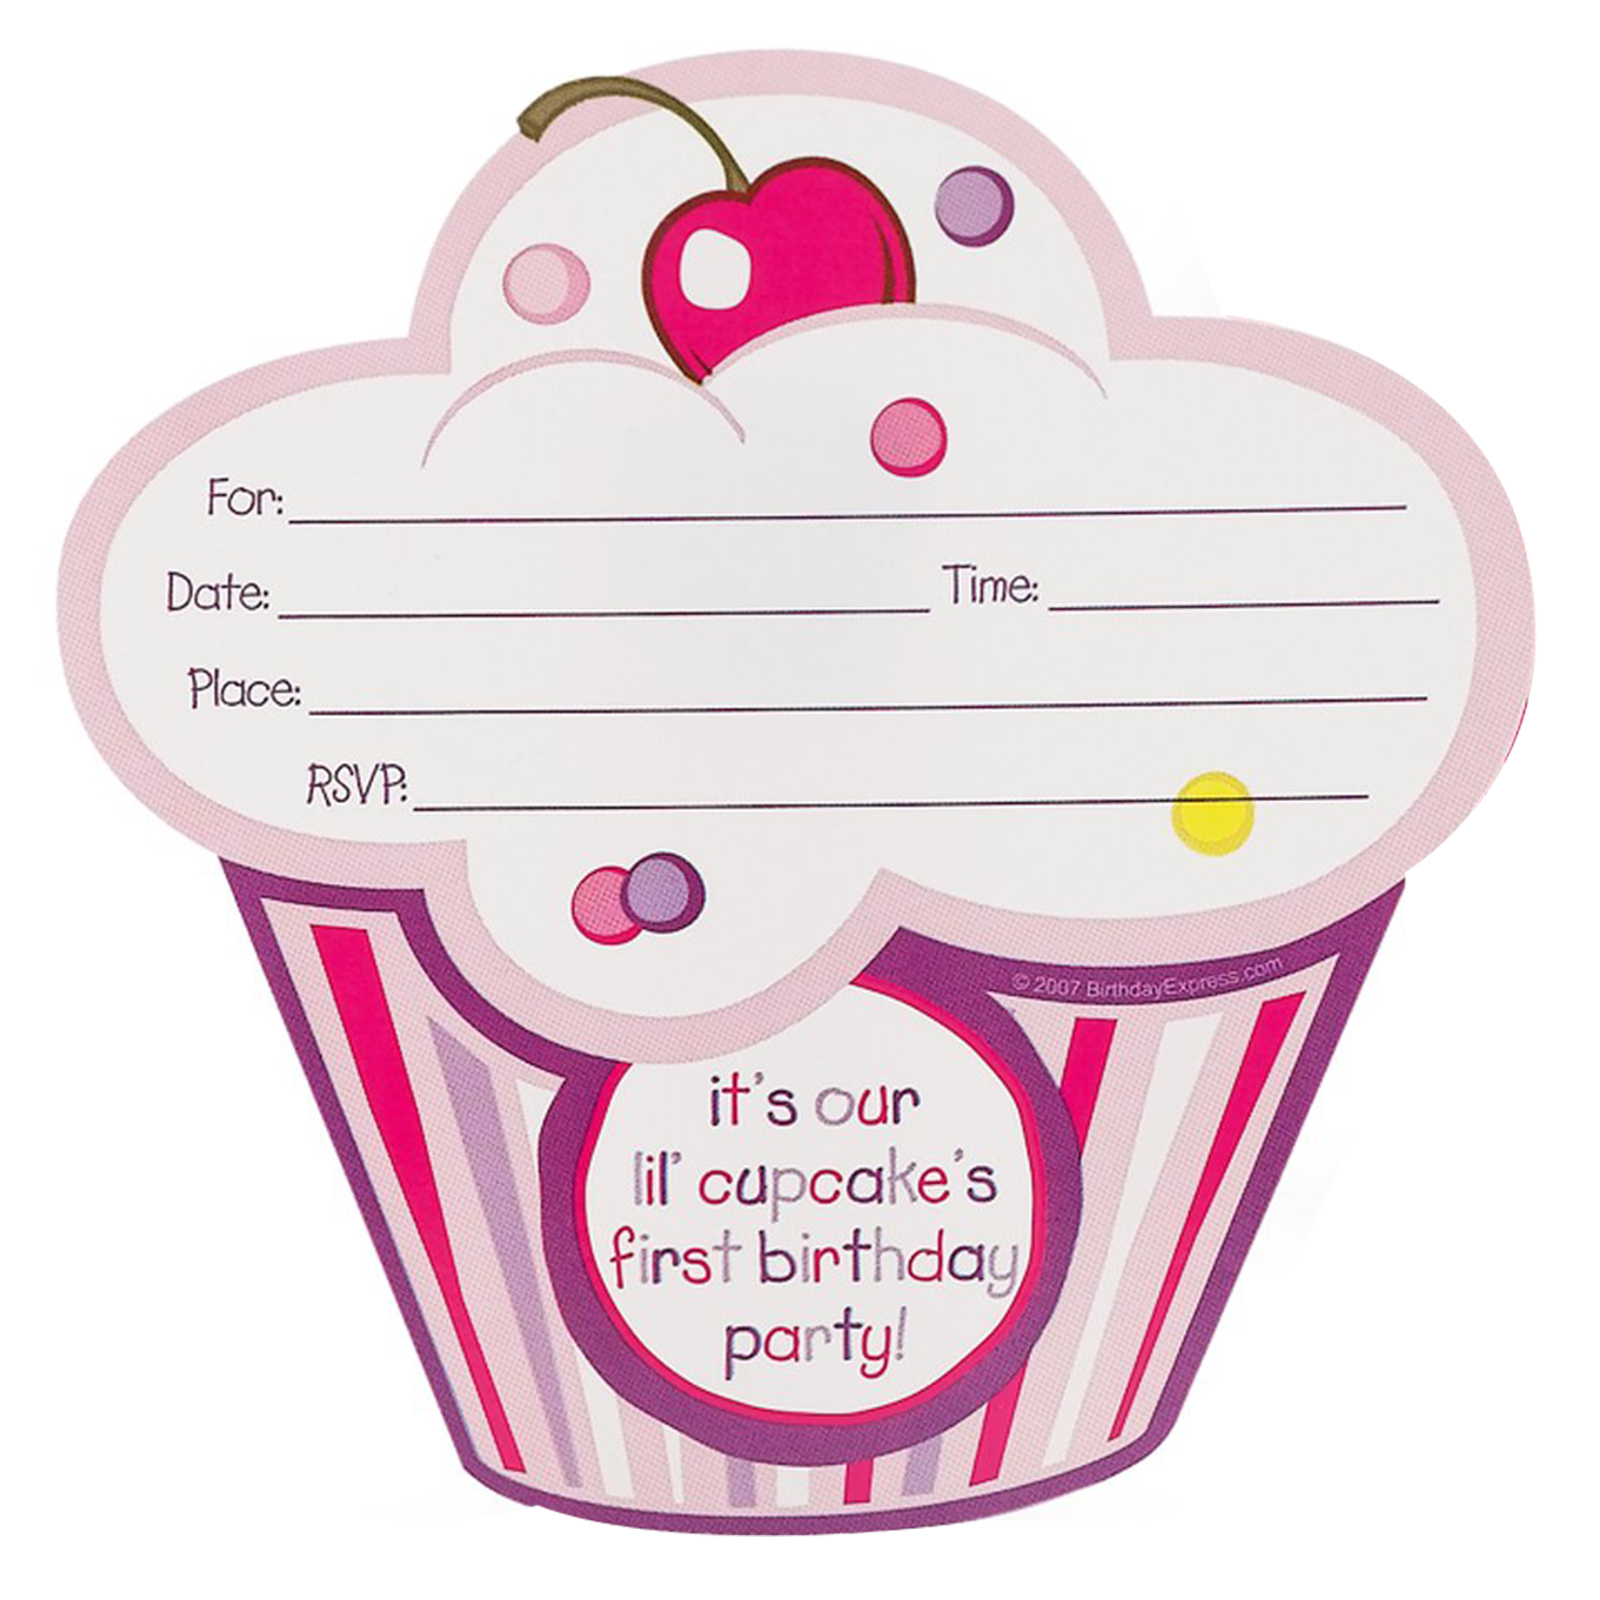 Girls Lil Cupcake 1st Birthday Invitations BirthdayExpresscom